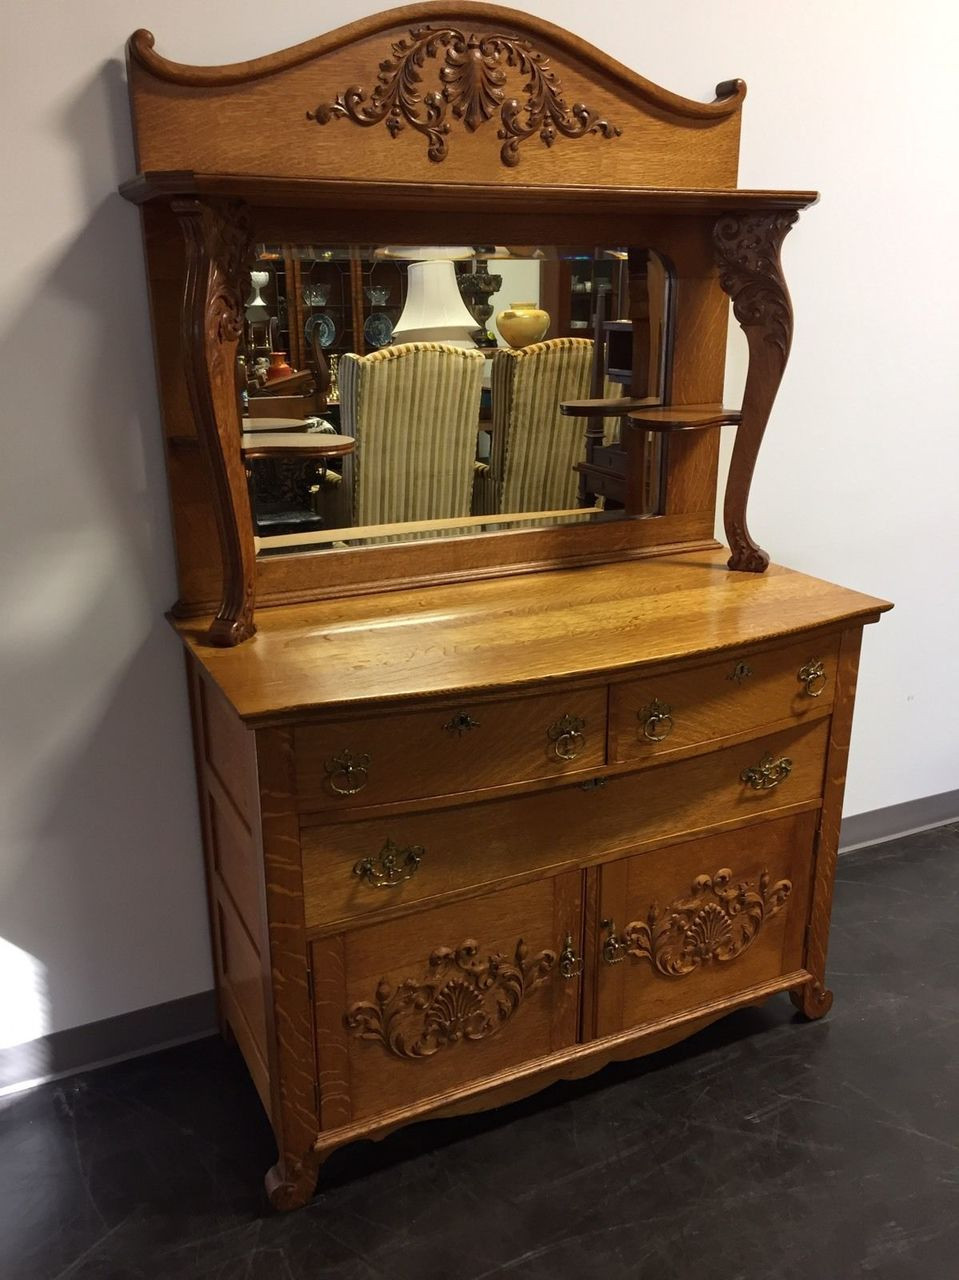 Sold Out Antique Victorian Quartersawn Tiger Oak Sideboard Buffet Beveled Mirror Backsplash Boyd S Fine Furnishings